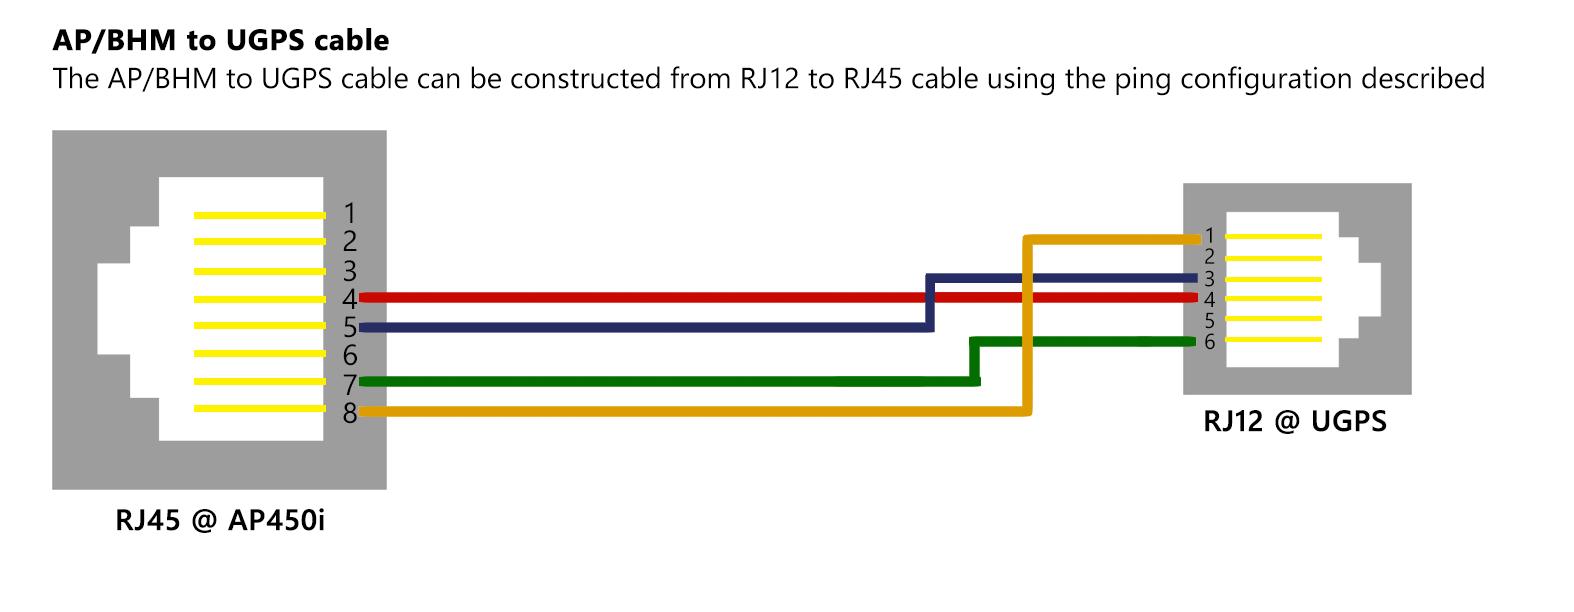 DIAGRAM] Rj11 Rj12 Wiring Diagram FULL Version HD Quality Wiring Diagram -  DIAGRAM-A.OHMYDEVS.FRDiagram Database - Database Structure and Design Tutorial